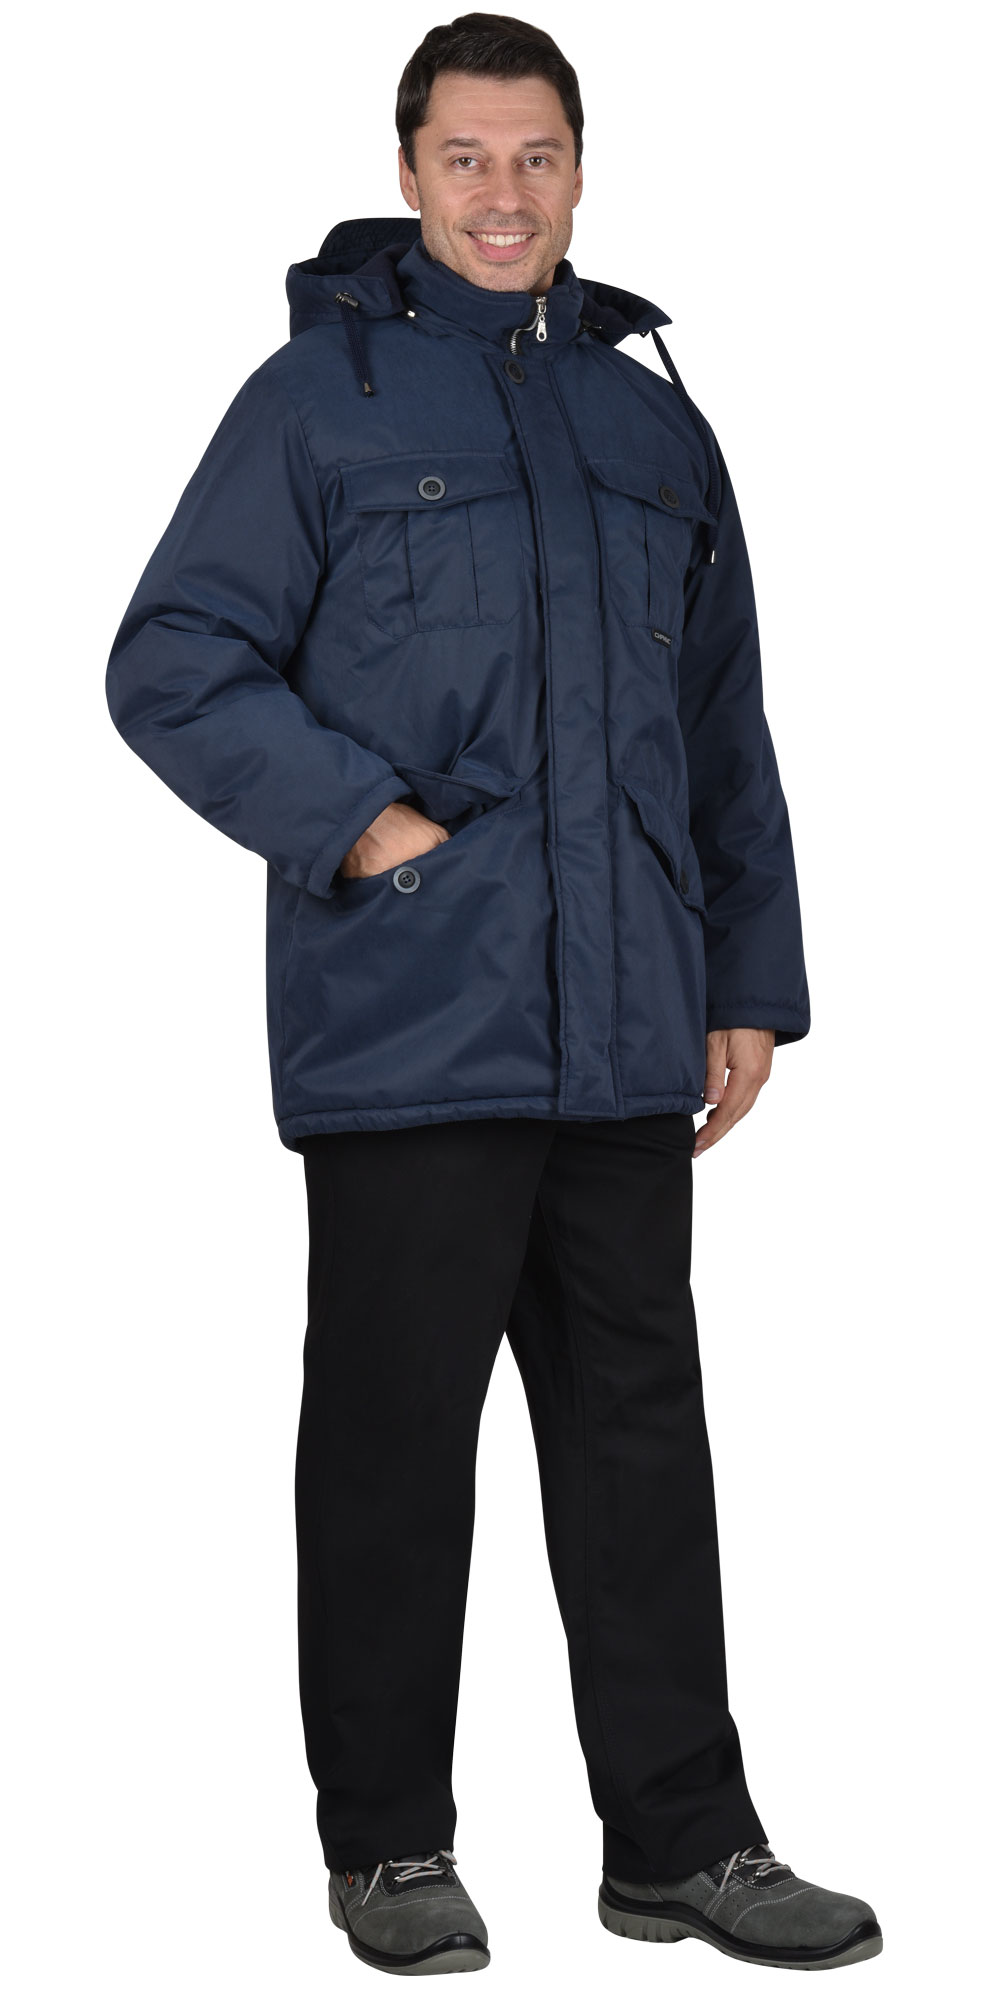 Куртка «Элит» утепленная мужская ЦЕНА: 2540.00